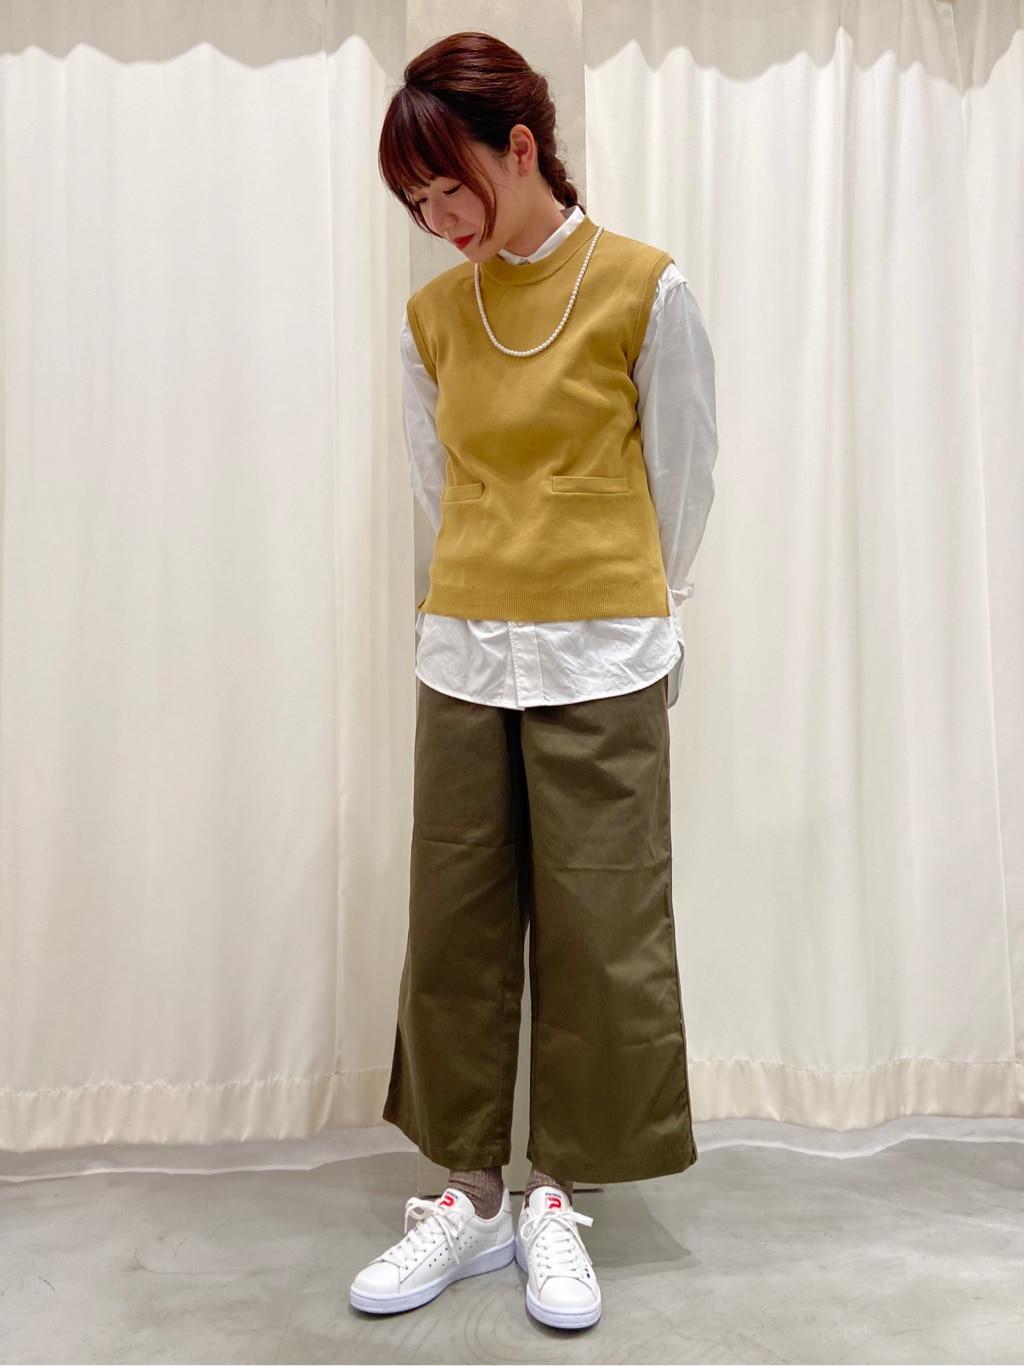 CHILD WOMAN , PAR ICI 東京スカイツリータウン・ソラマチ 2021.02.06